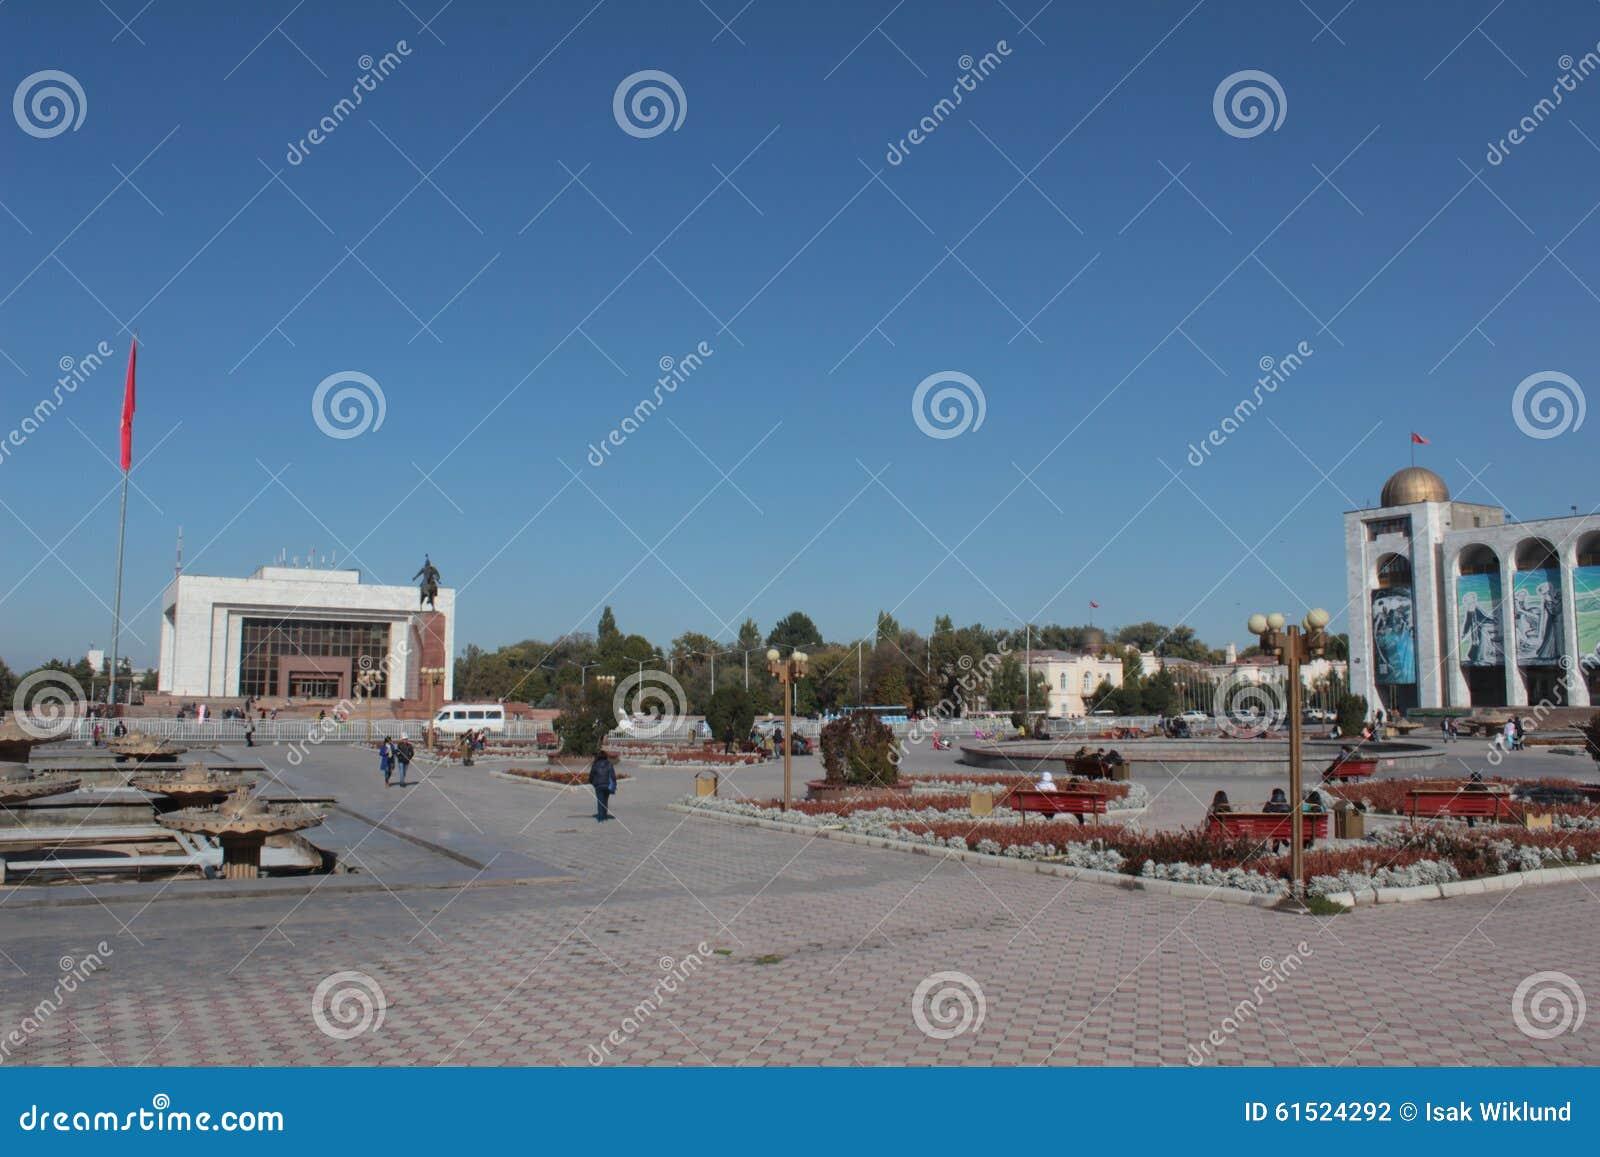 Alaa-too square in central Bishkek, kyrgyzstan